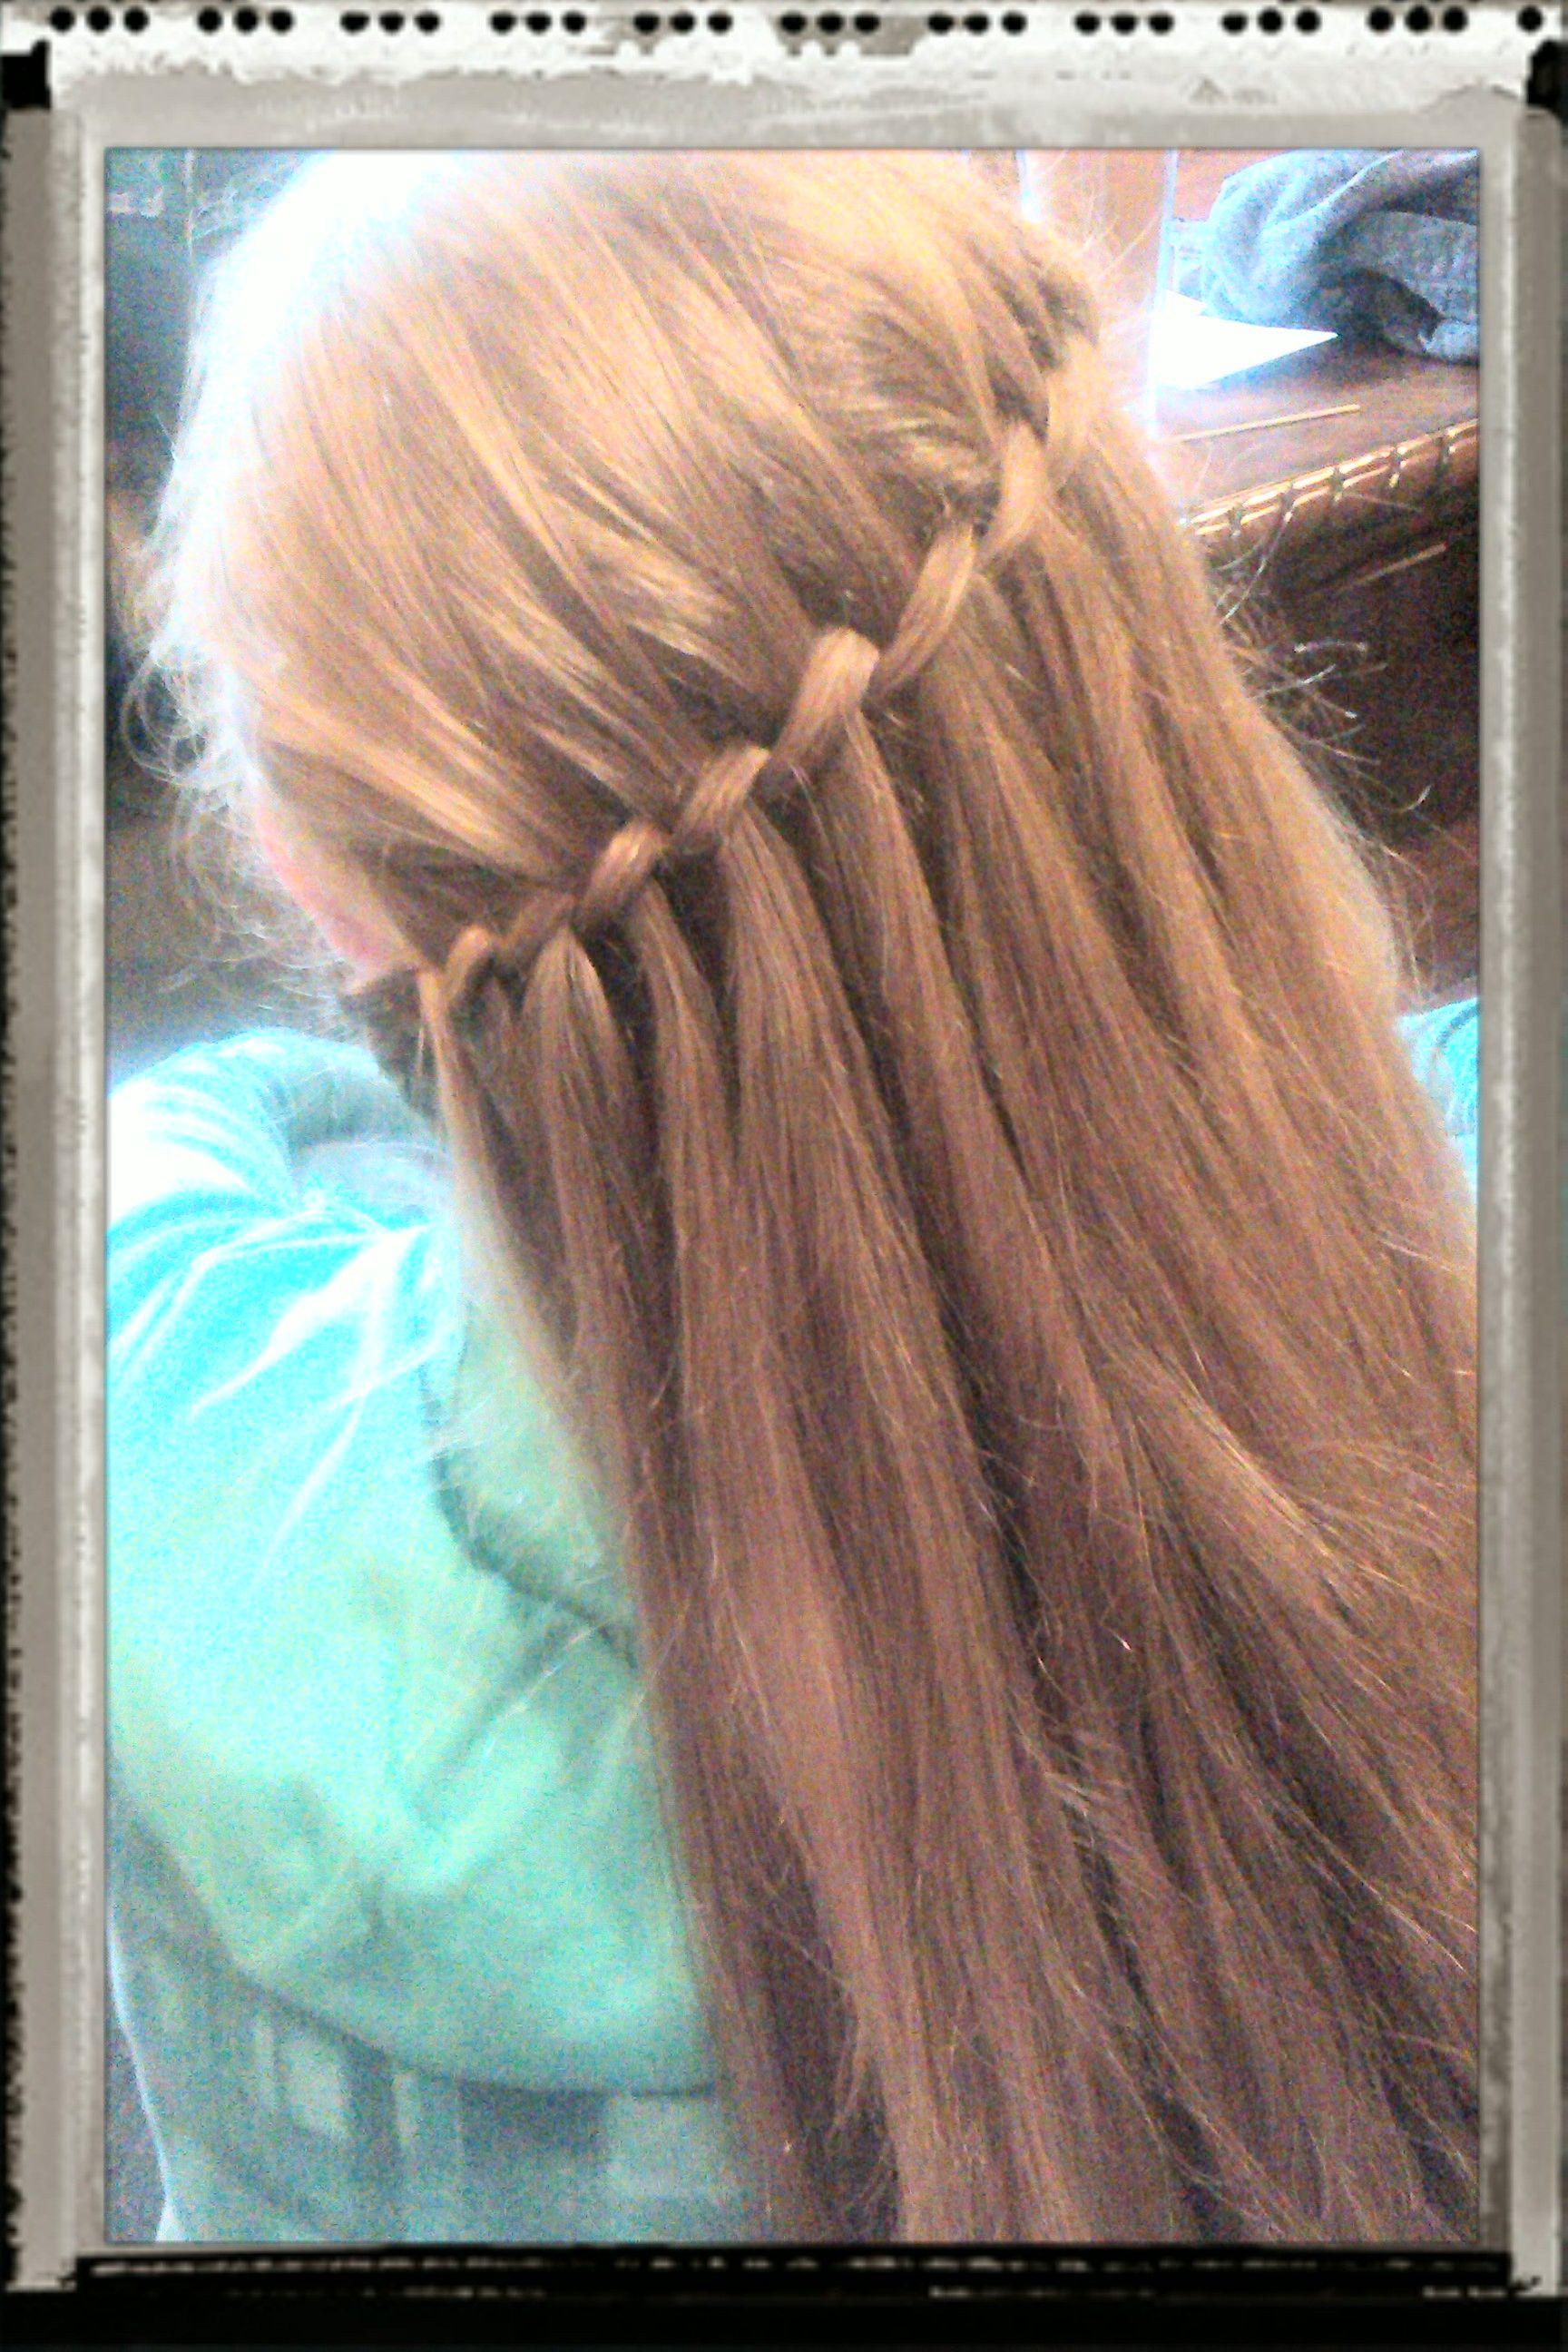 Waterfall braid on a slant Hair Styles Pinterest Hair style